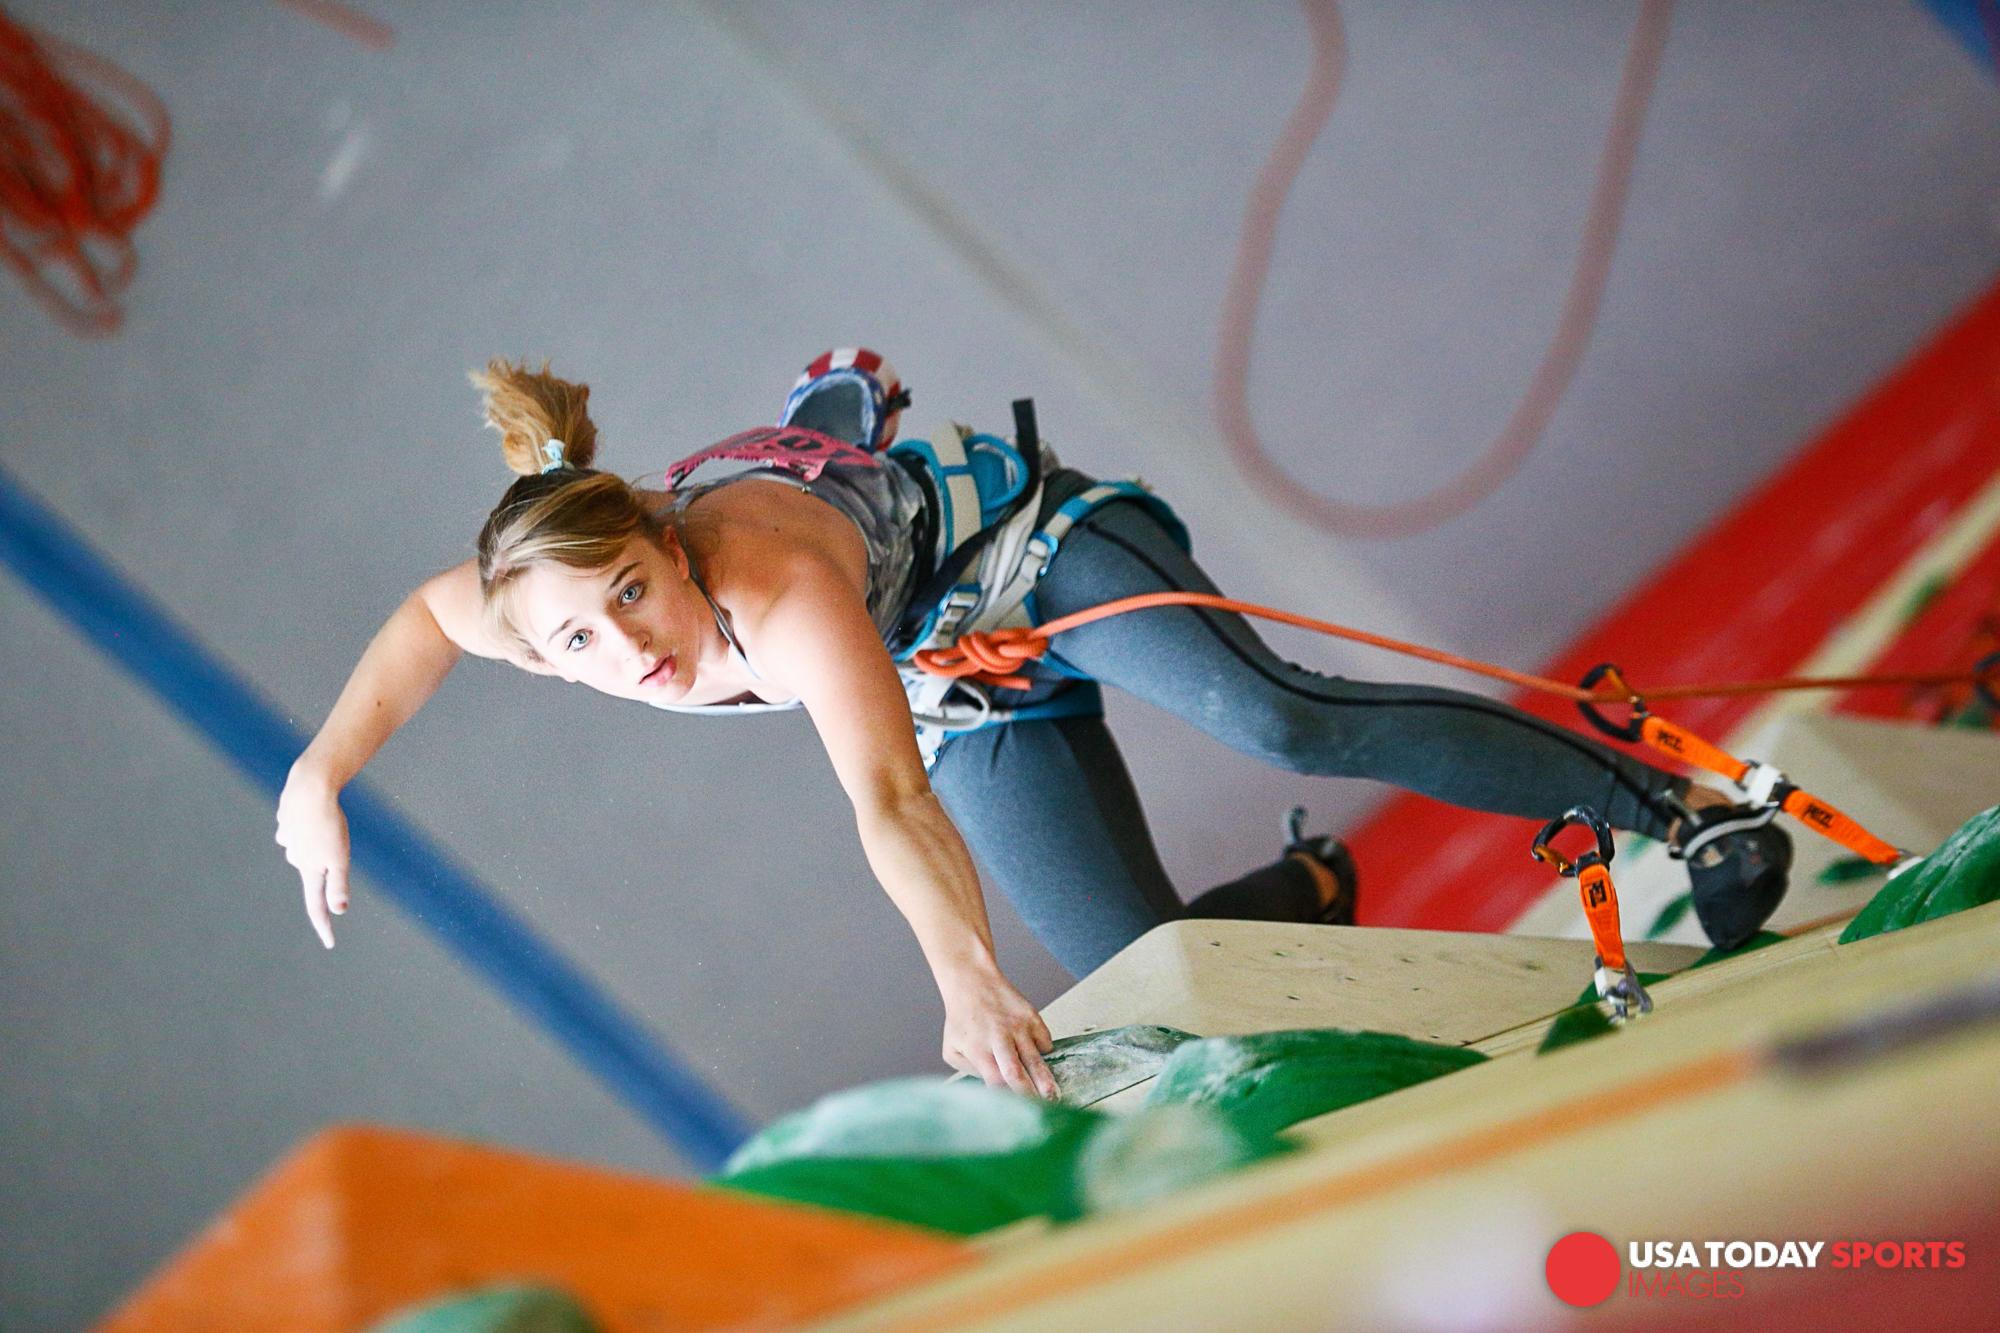 Garrett_Reid_atlanta_advertising_commercial_photographer_sport_and_speed_youth_national_chap_climbing-25.jpg